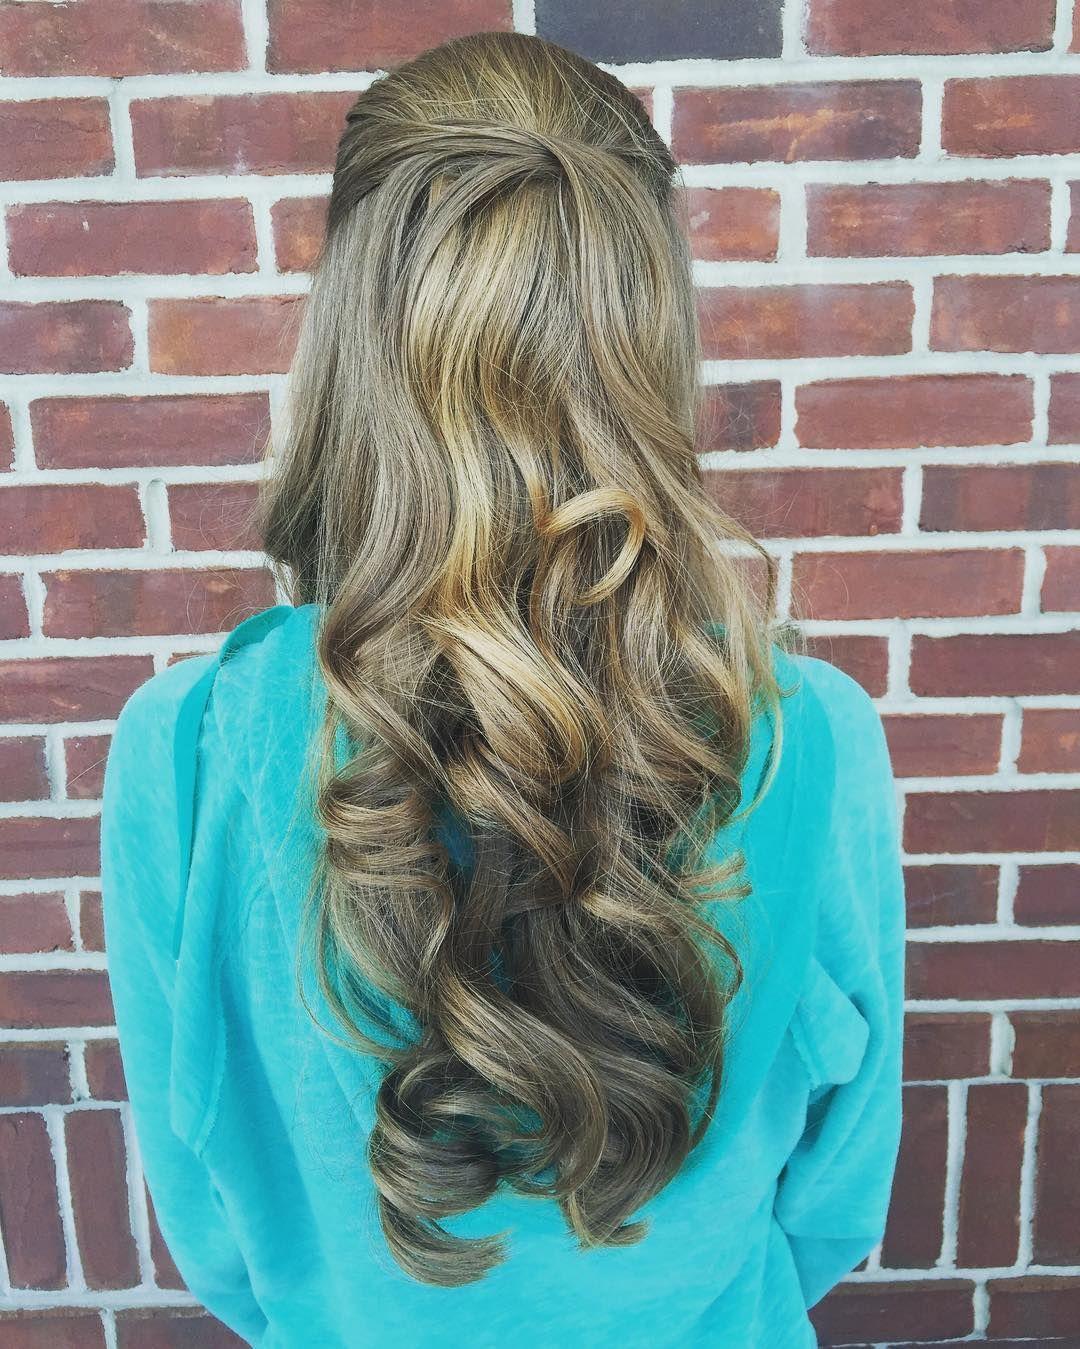 60 Cute Easy Half Up Half Down Hairstyles: Wedding, Prom